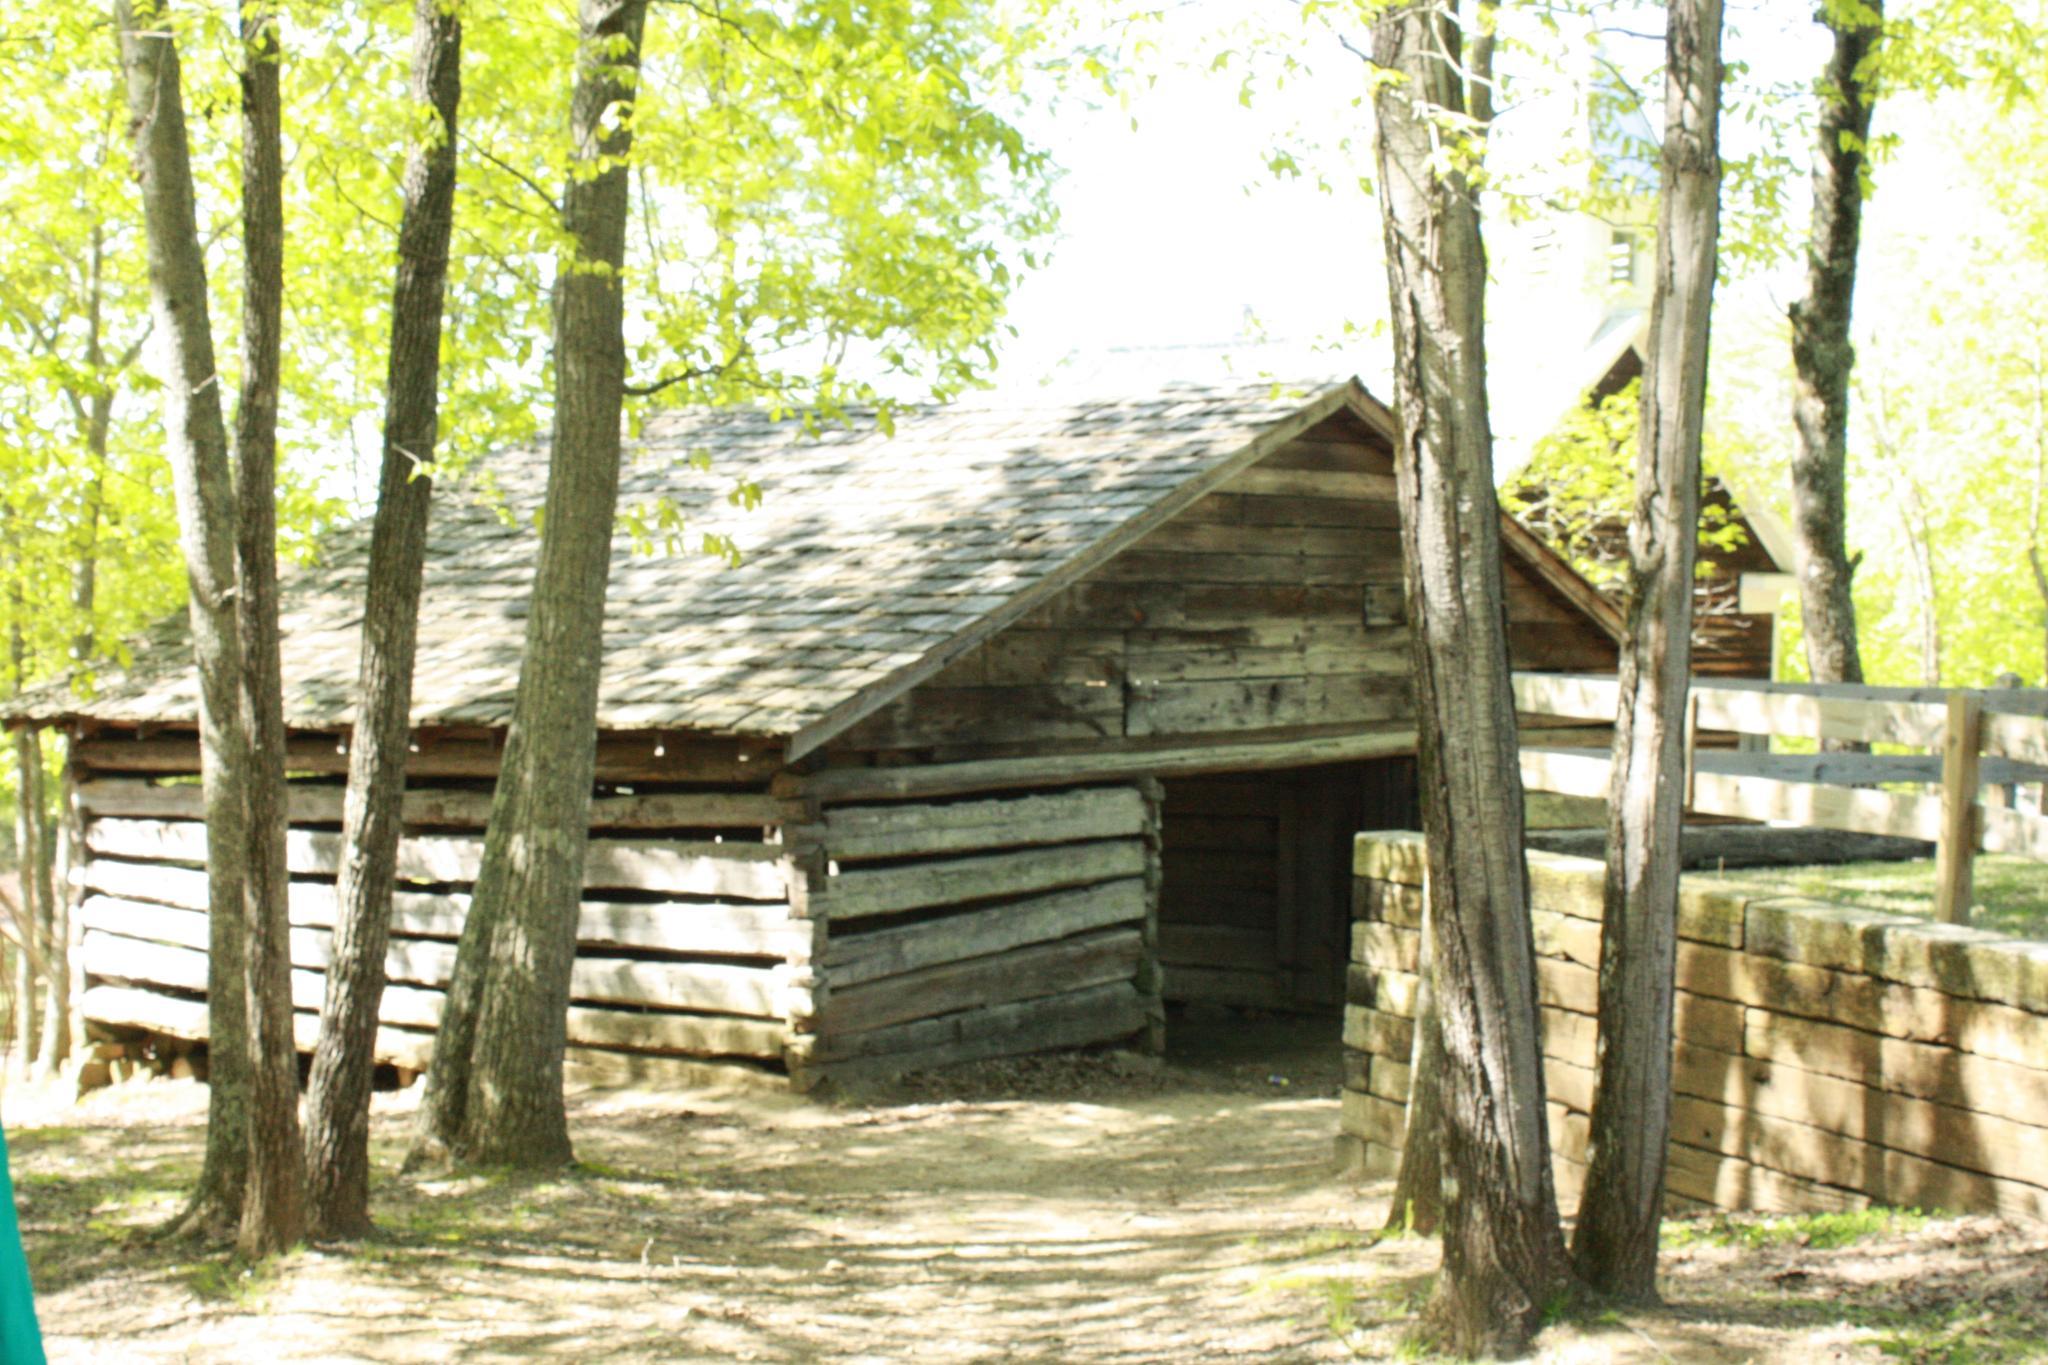 Old Barn at Palisades Park in Oneonta, AL by angela.hatchett.161